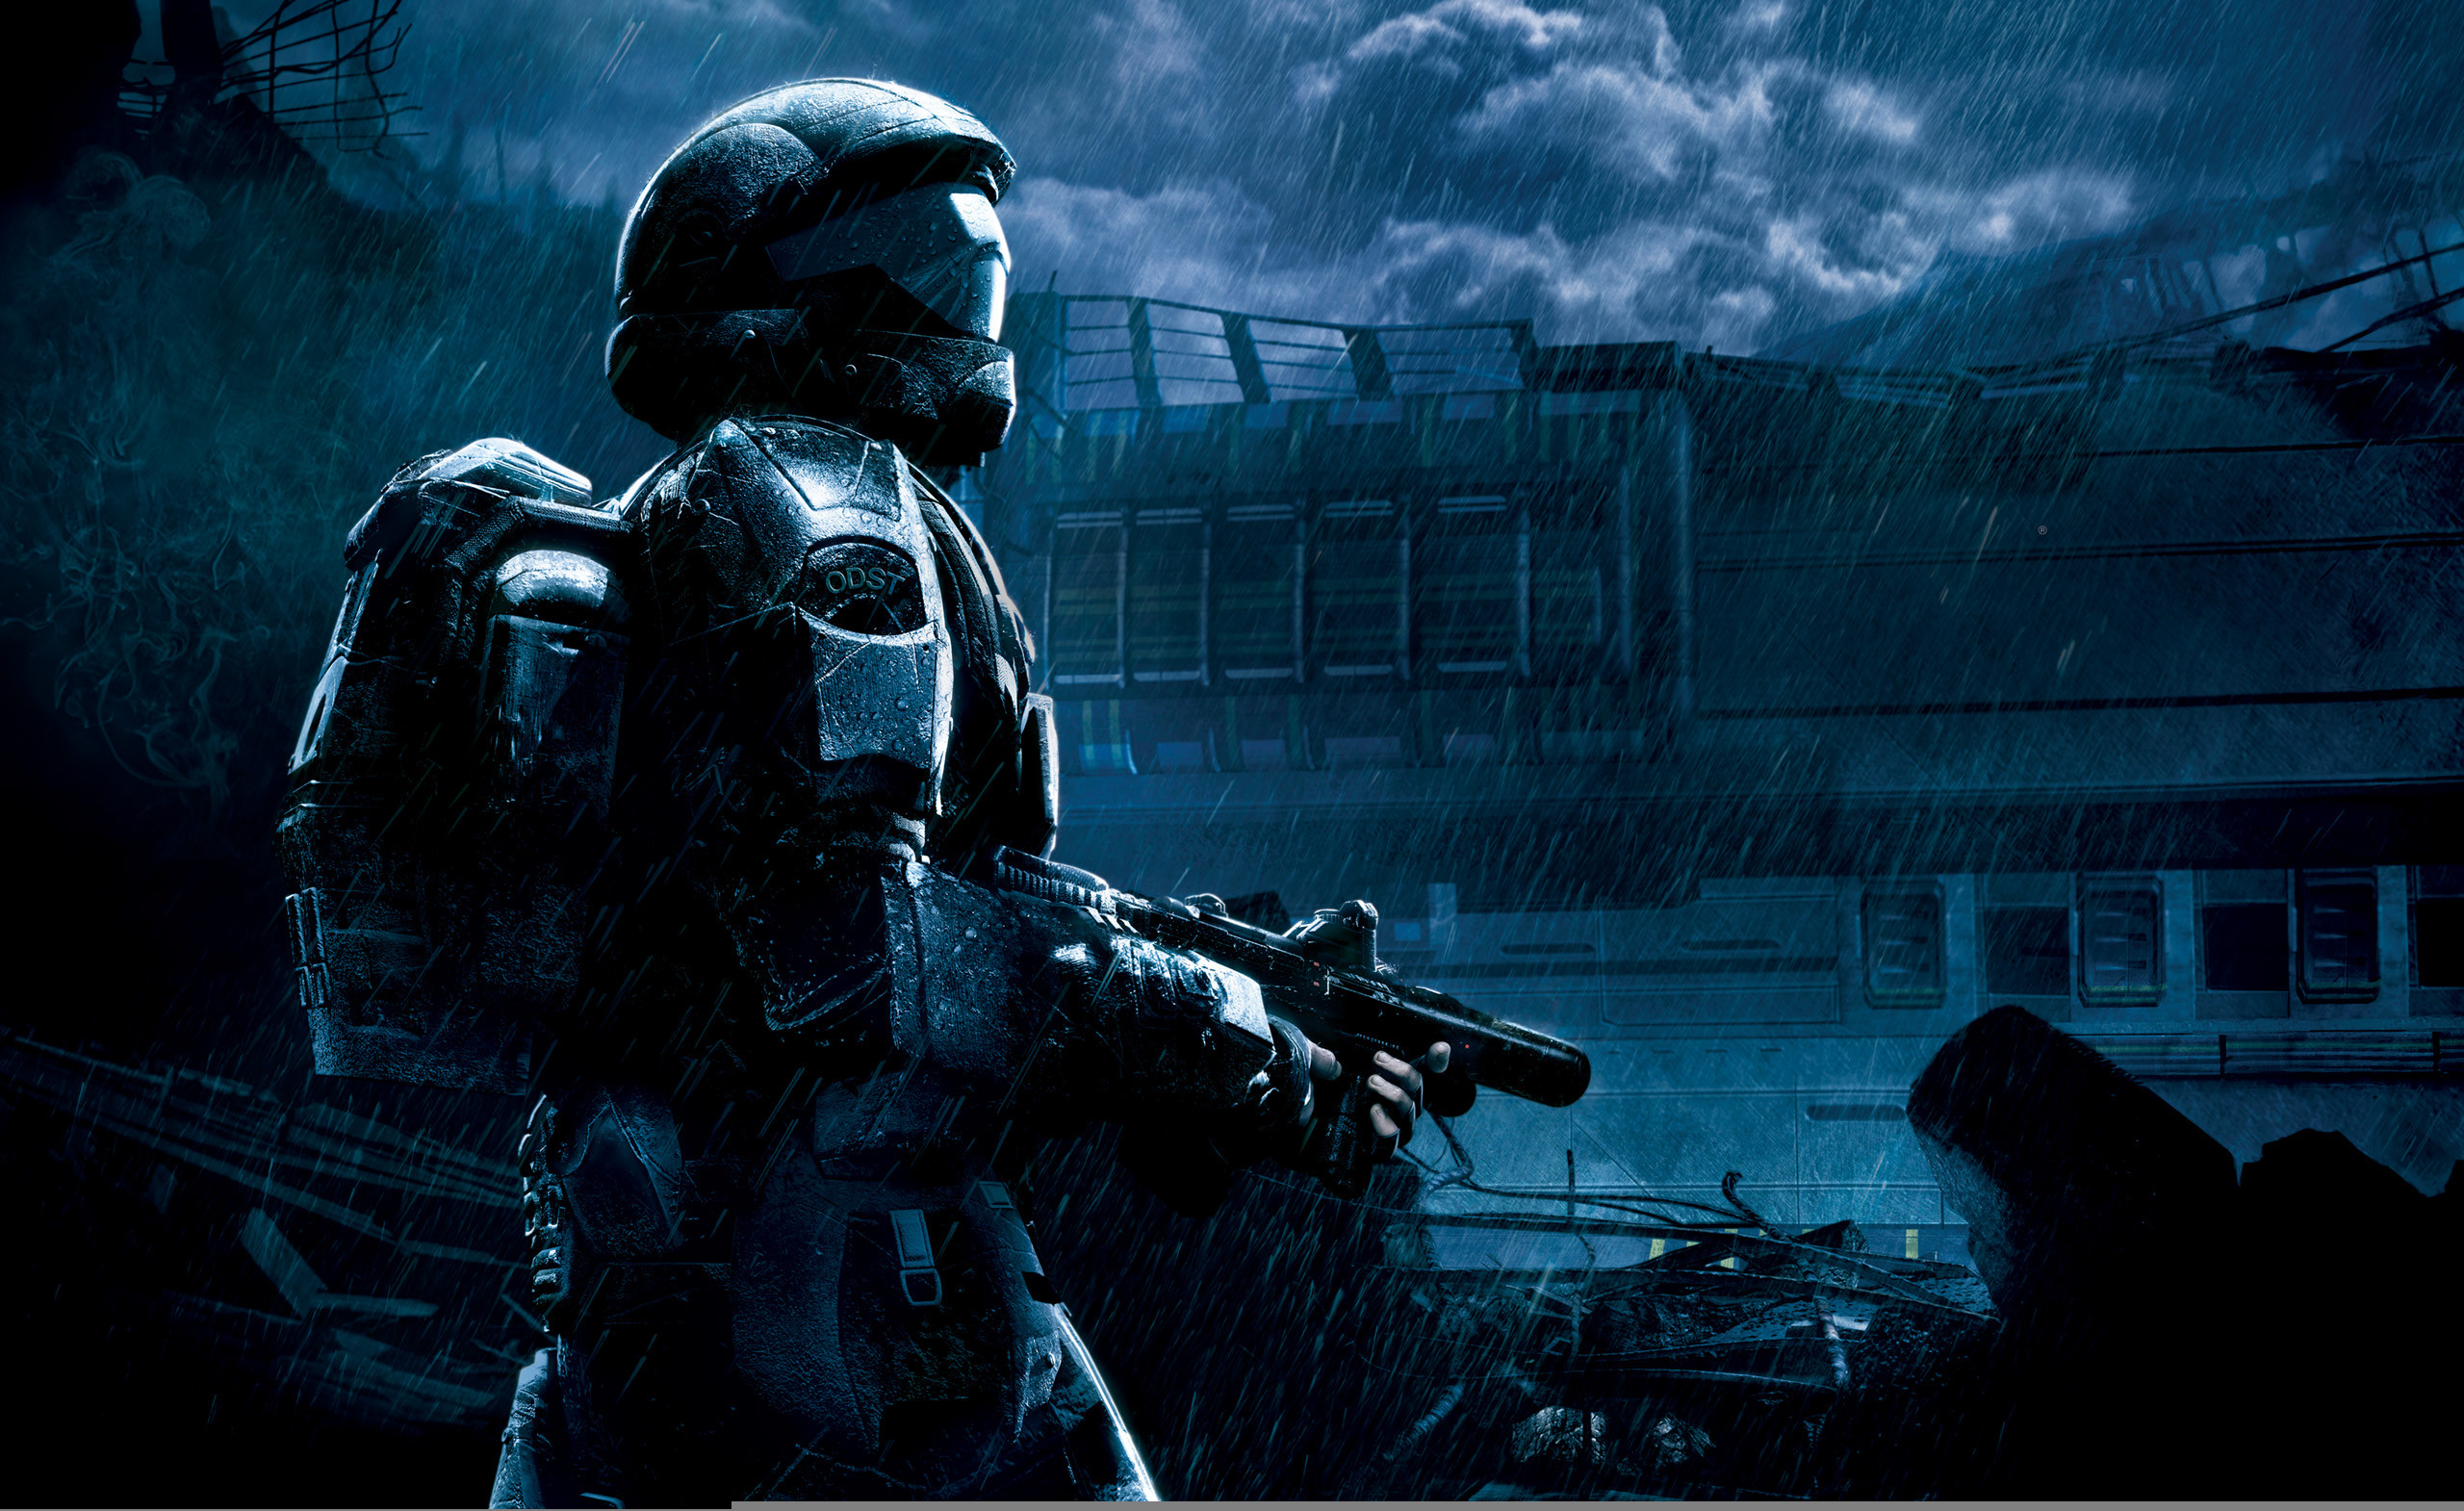 Halo-Wallpaper-High-Quality-HD